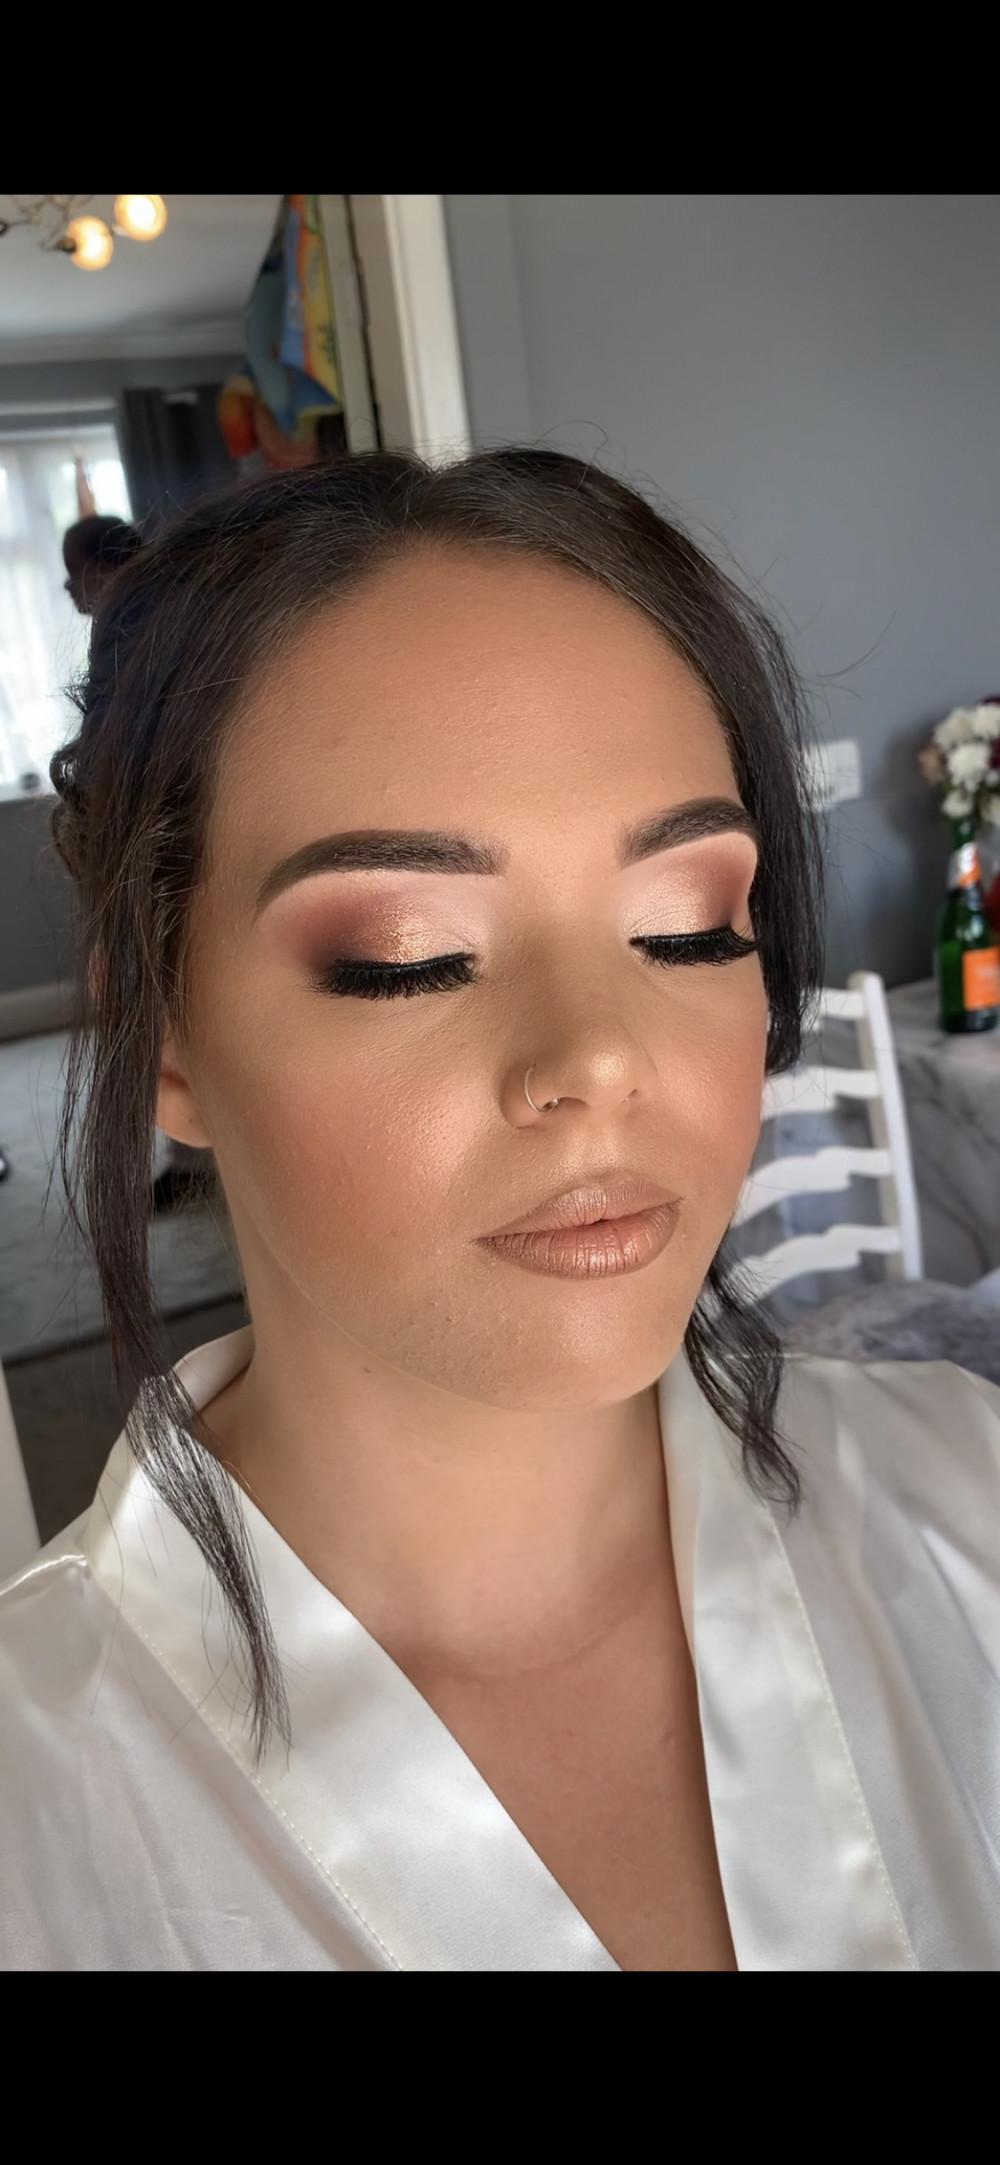 Glam bridal - Make Me Bridal Artist: Katy makeup artistry. Photography by: Katy swann. #glamorous